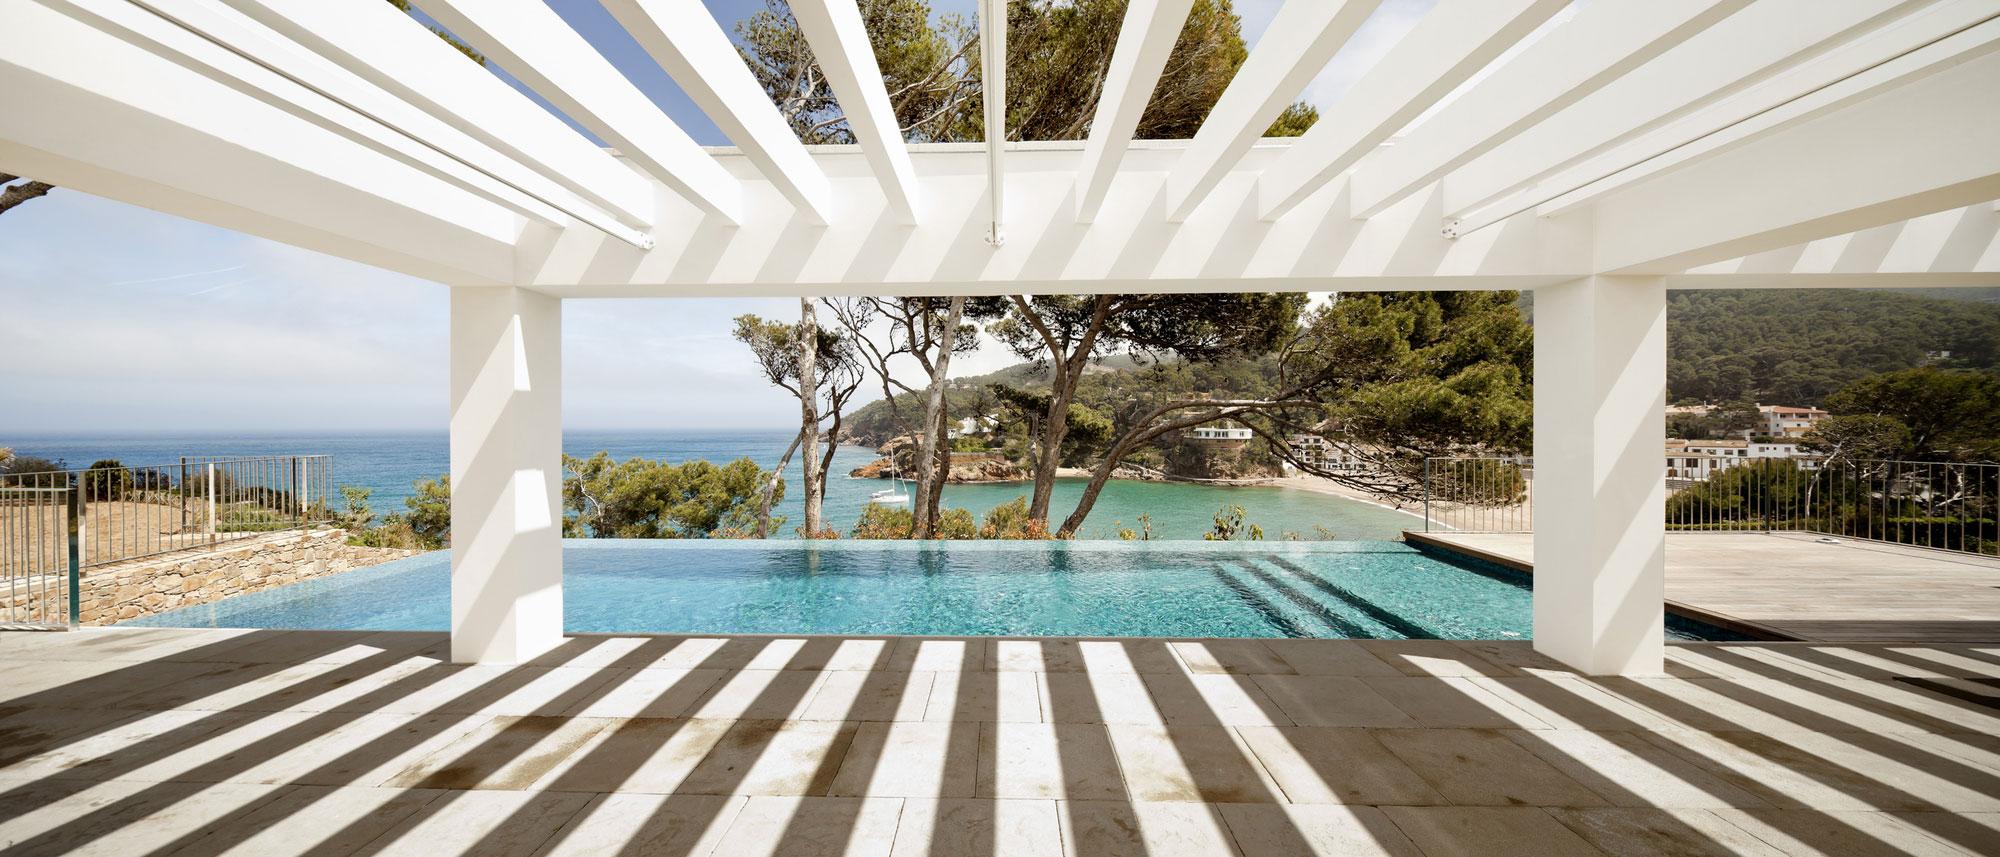 Veranda, Pool, Sea Views, Waterfront House in Costa Brava, Spain